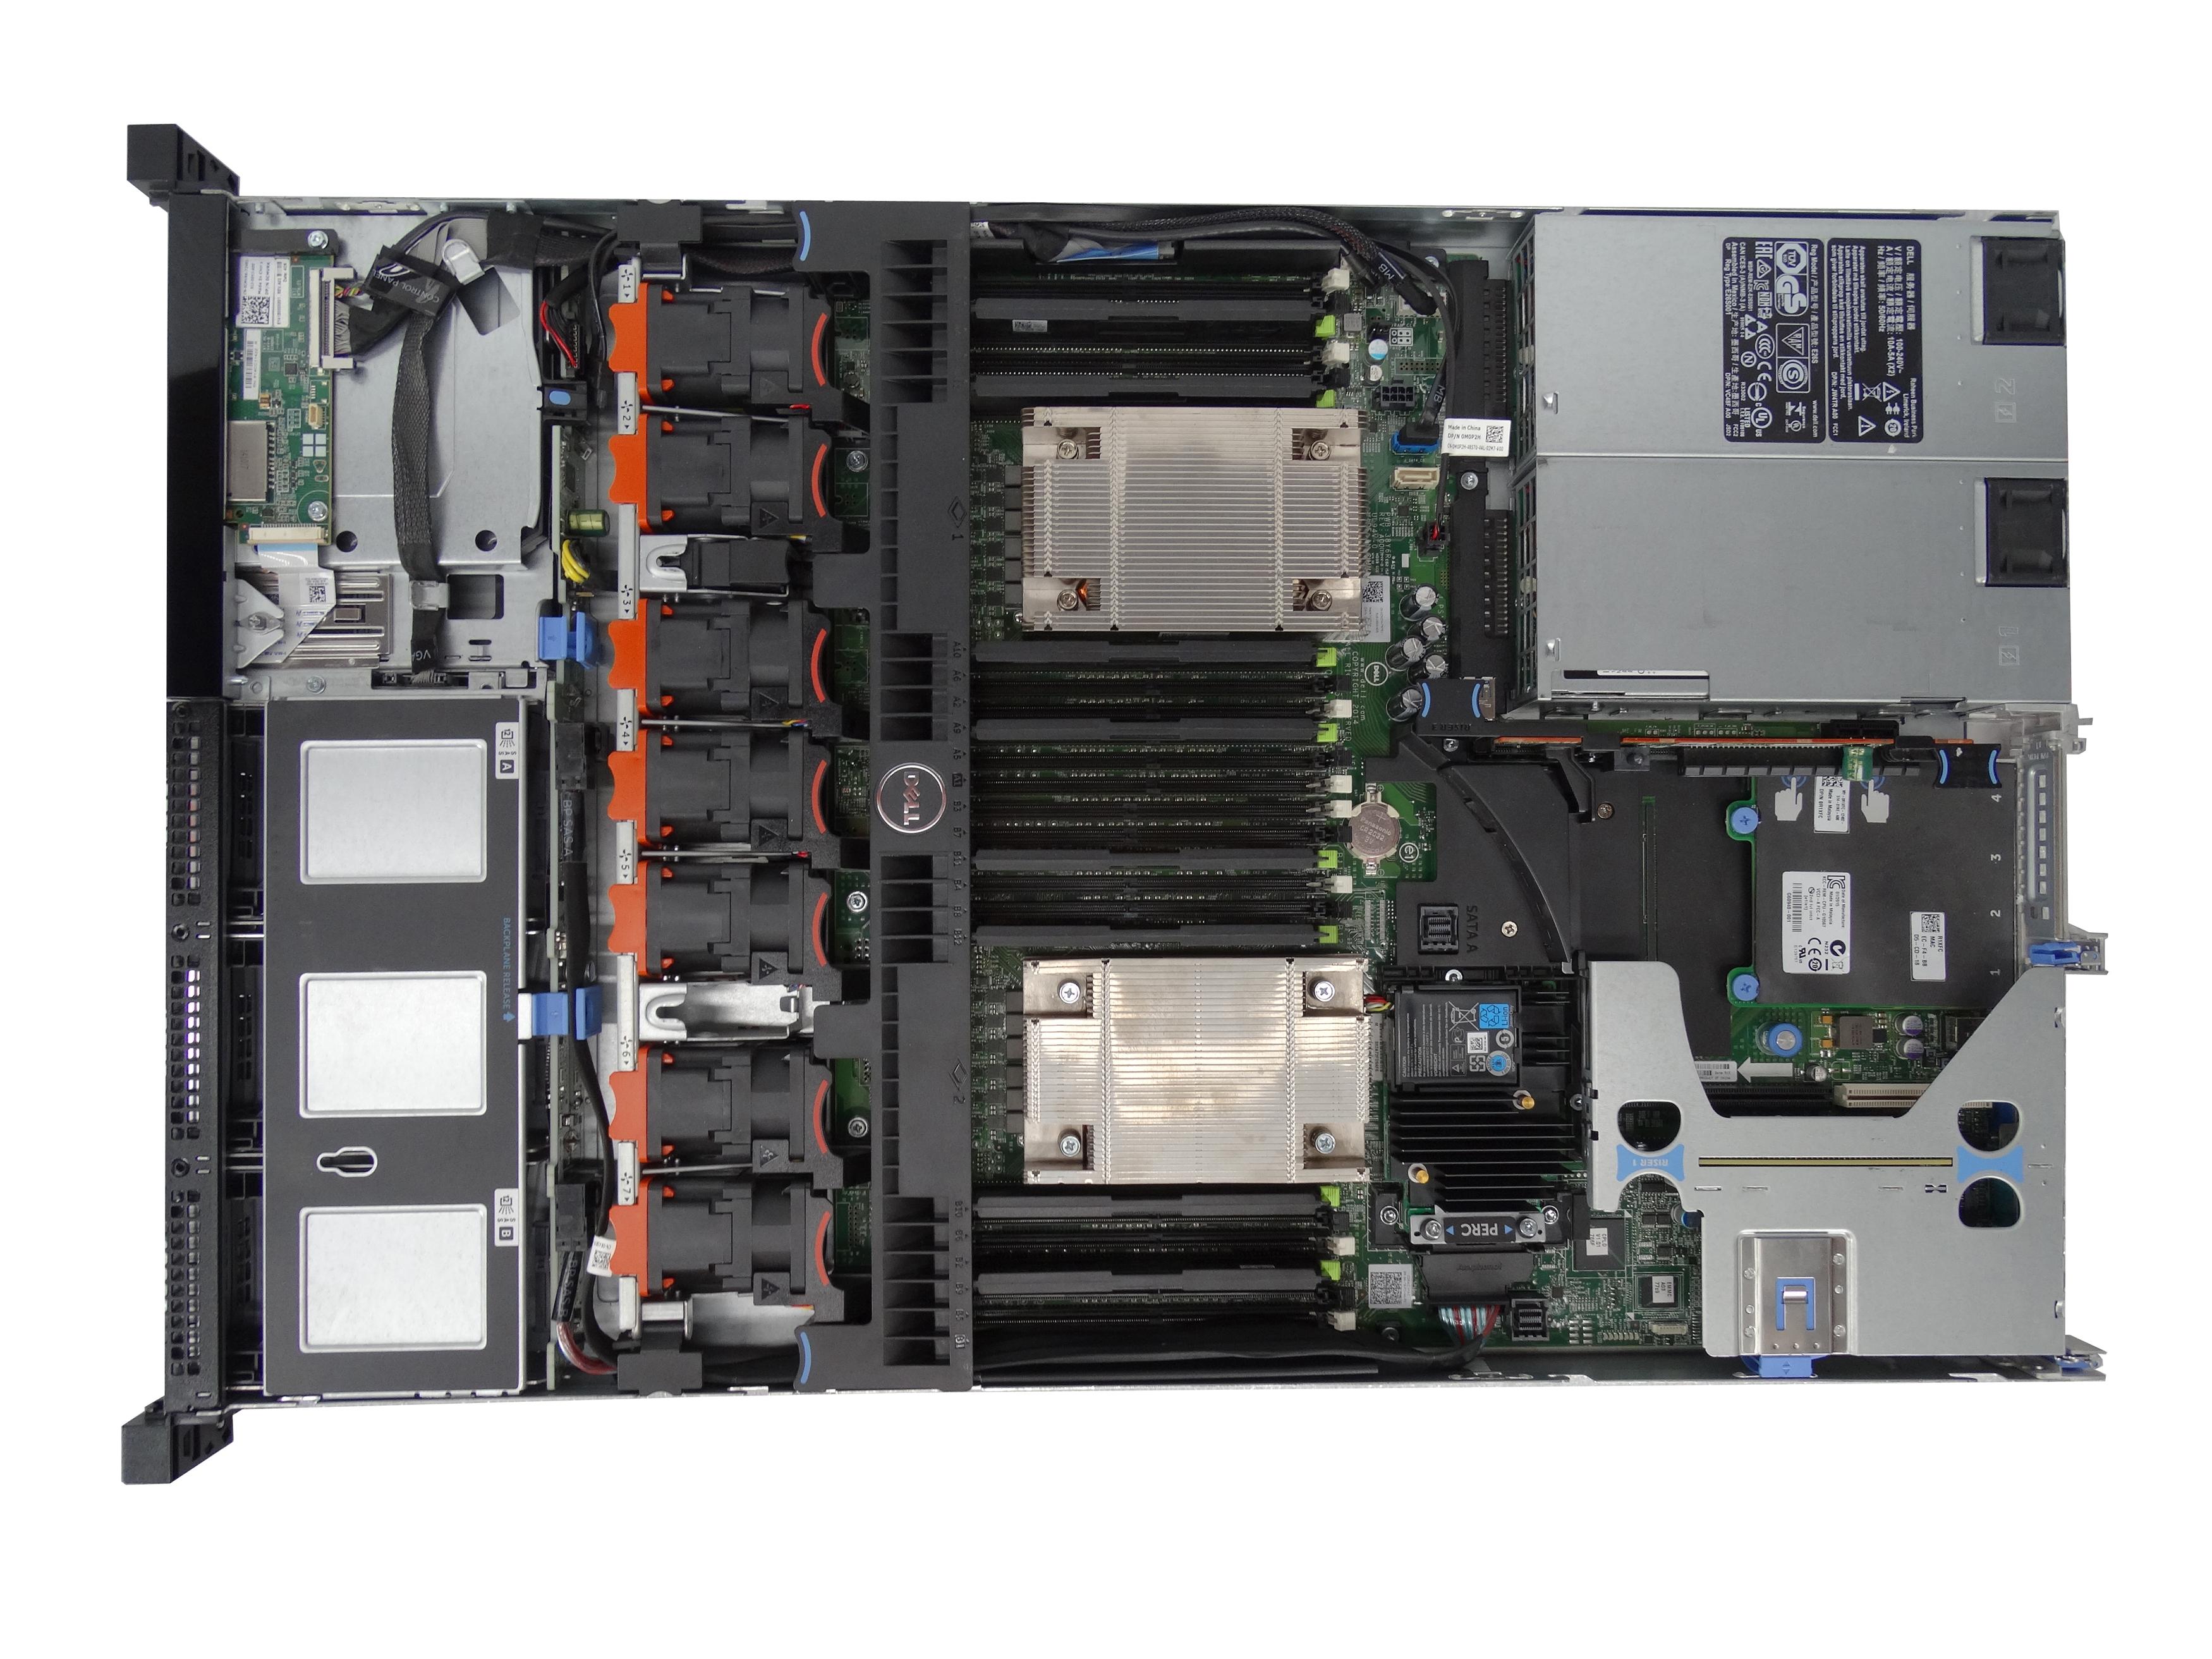 Dell PowerEdge R630 8-Bay 1U Rackmount Server